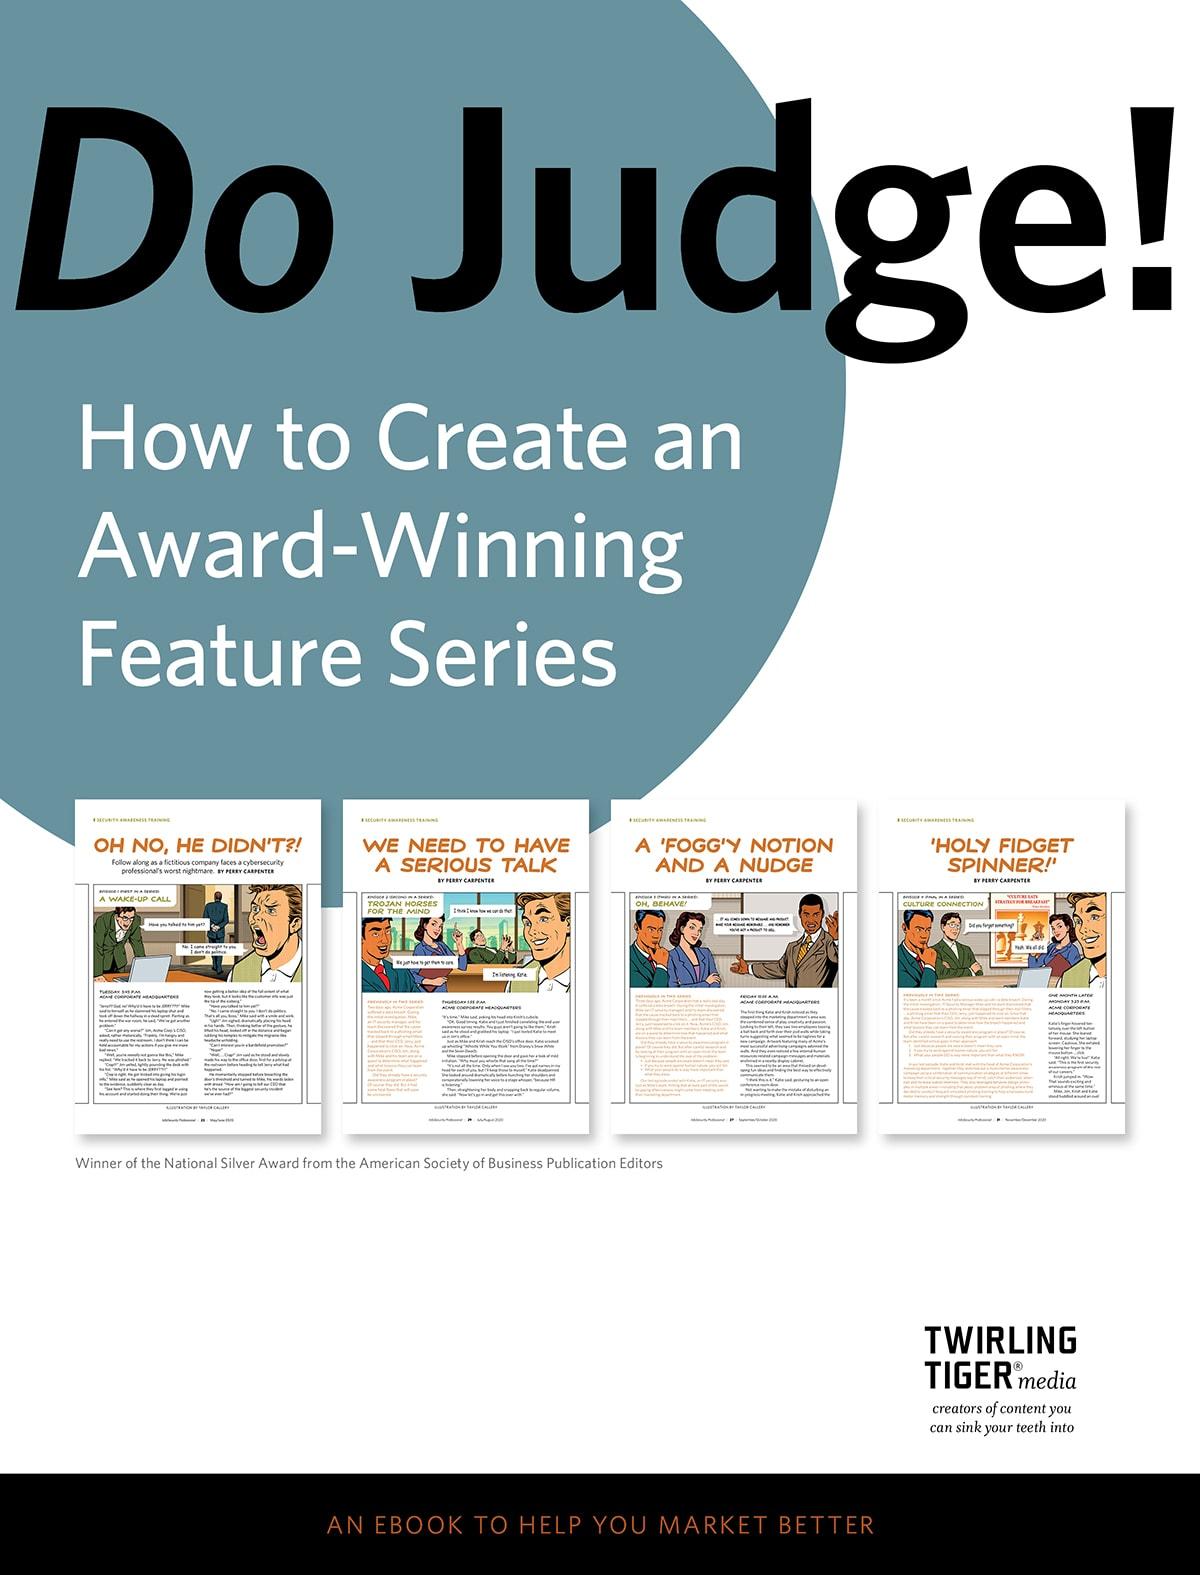 How to Create an Award-Winning Feature Series